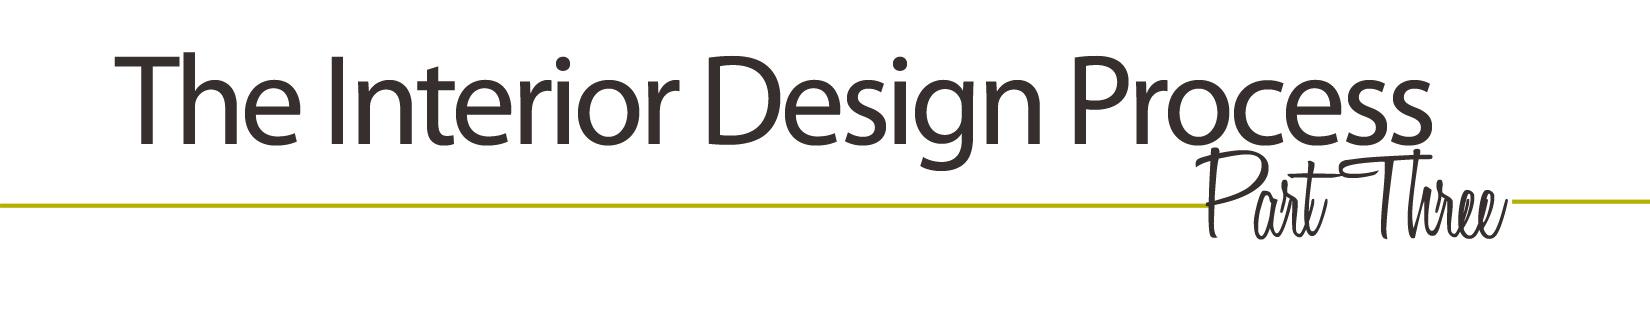 The interior design process part 3 jamie house design for Interior design process